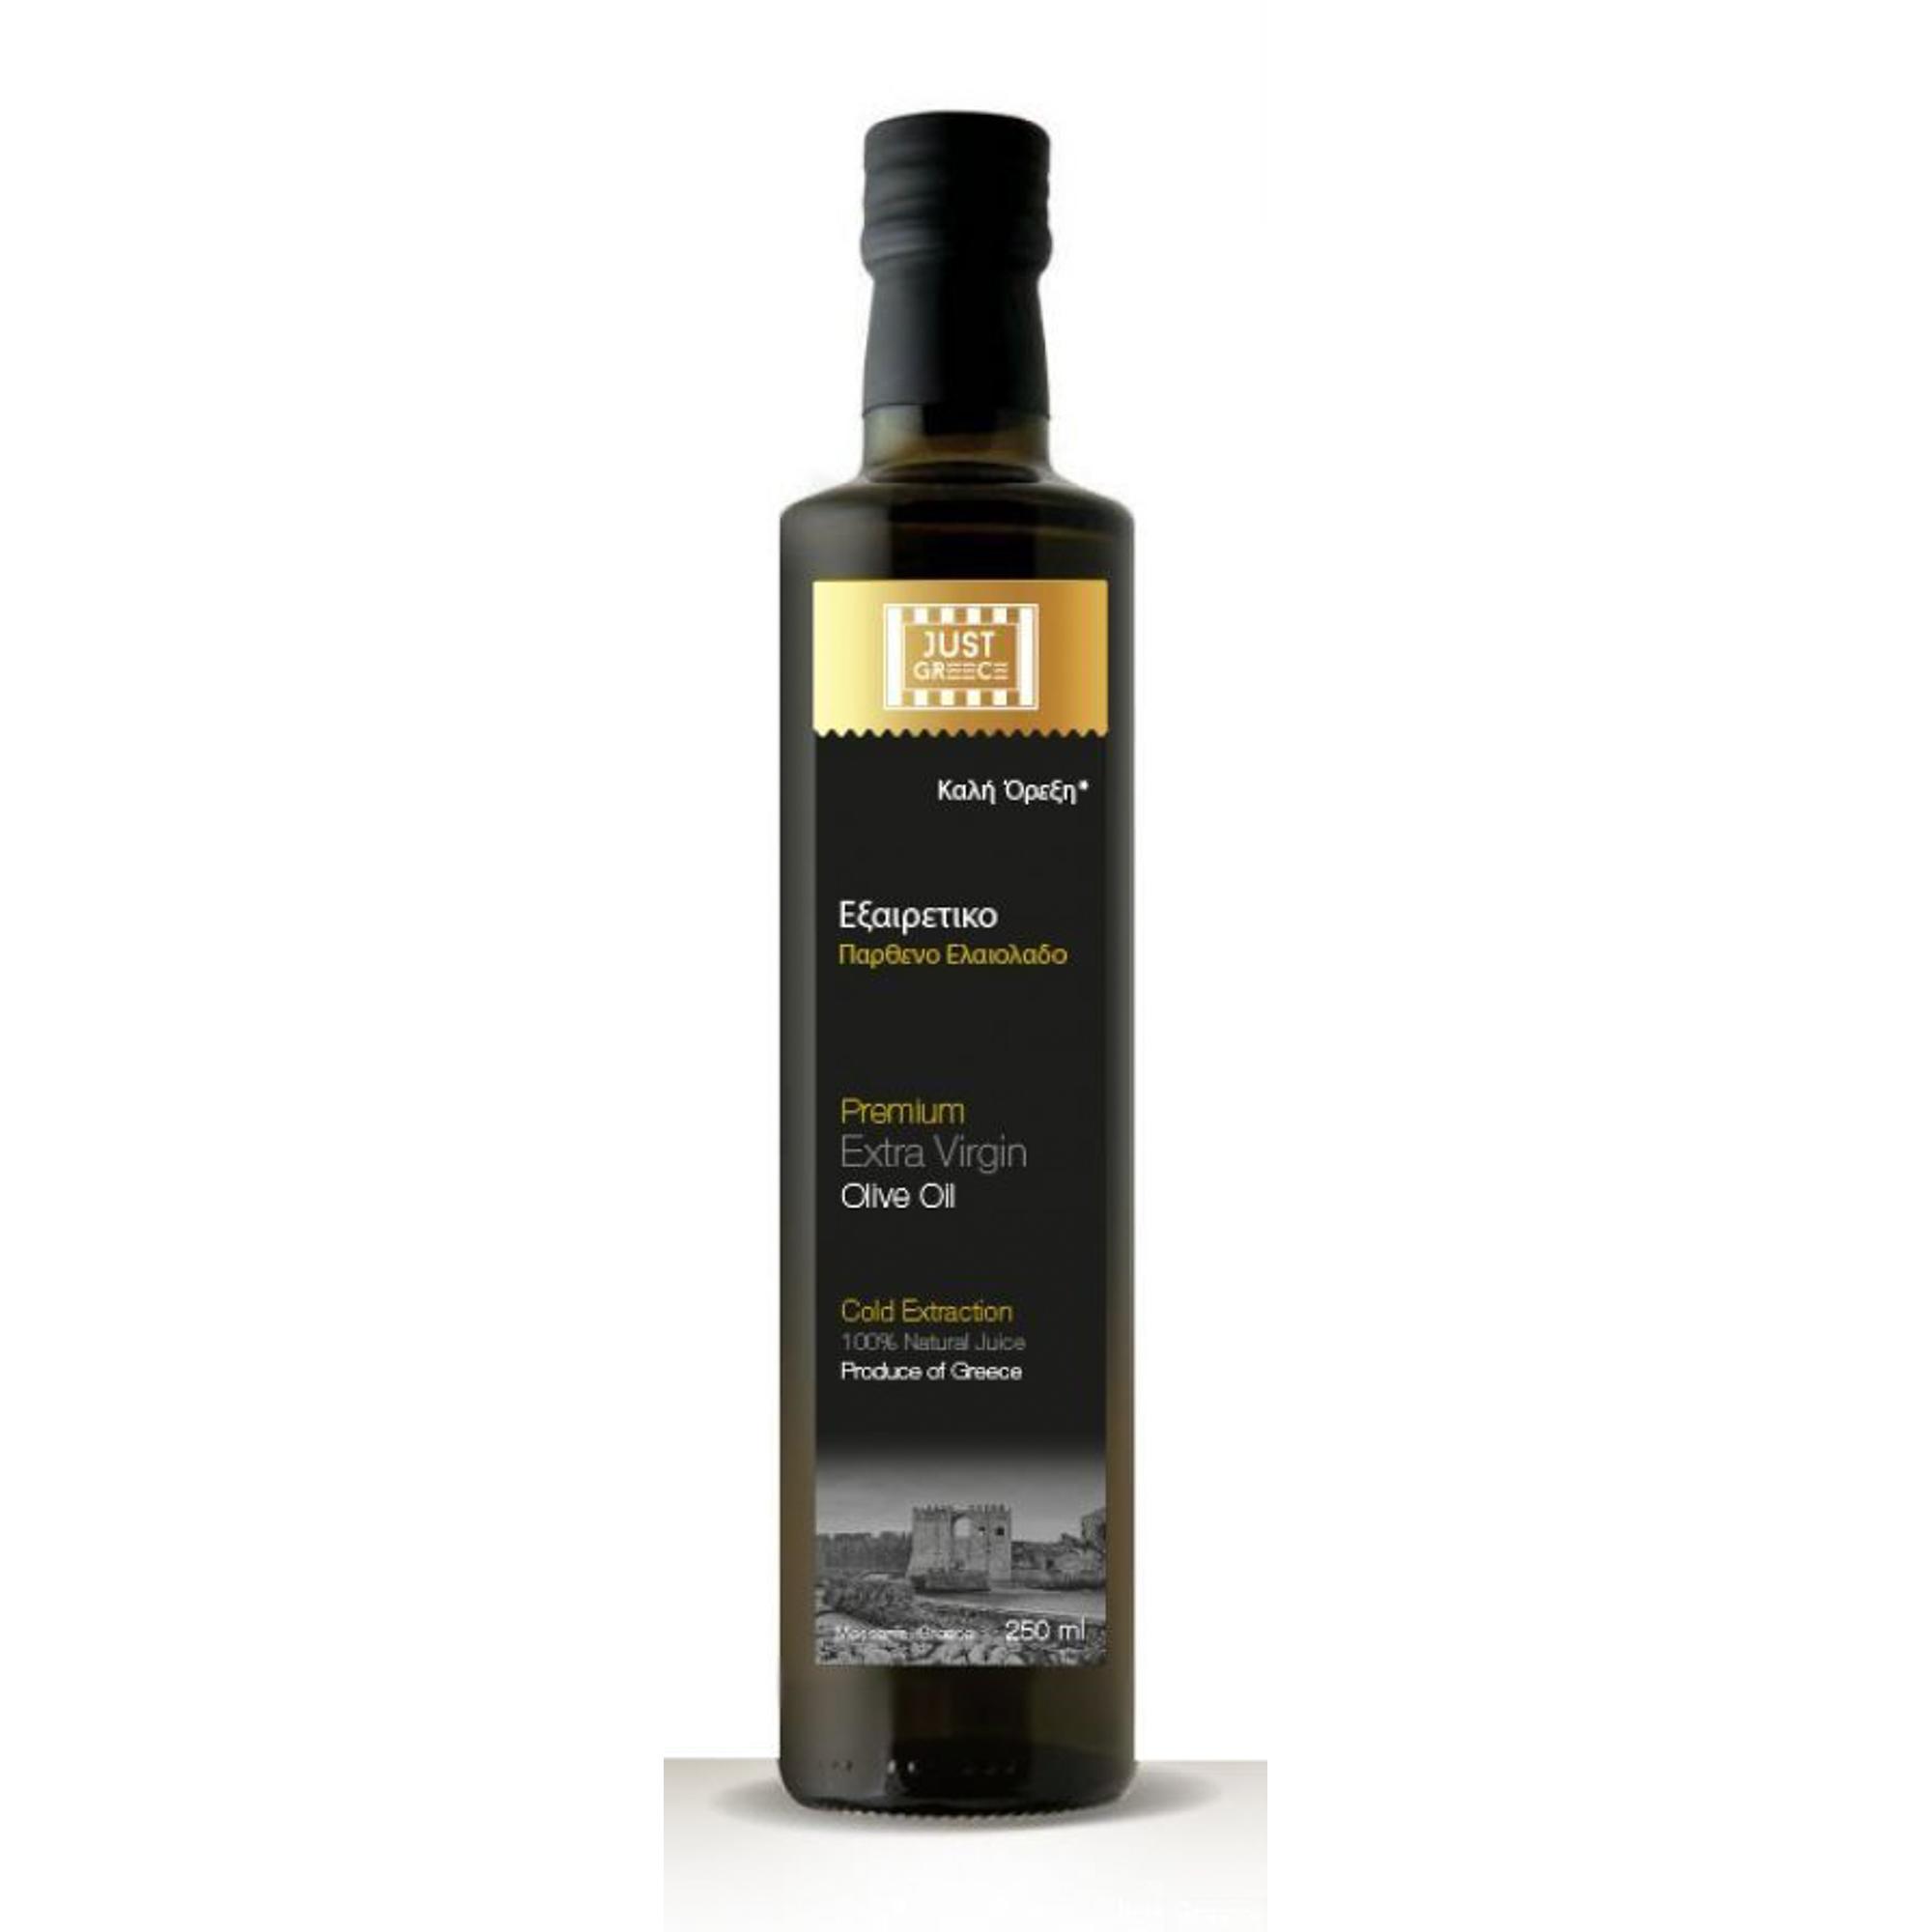 Масло оливковое JUST GREECE Extra Virgin 250 мл korvel оливковое масло extra virgin греция данае 250 мл